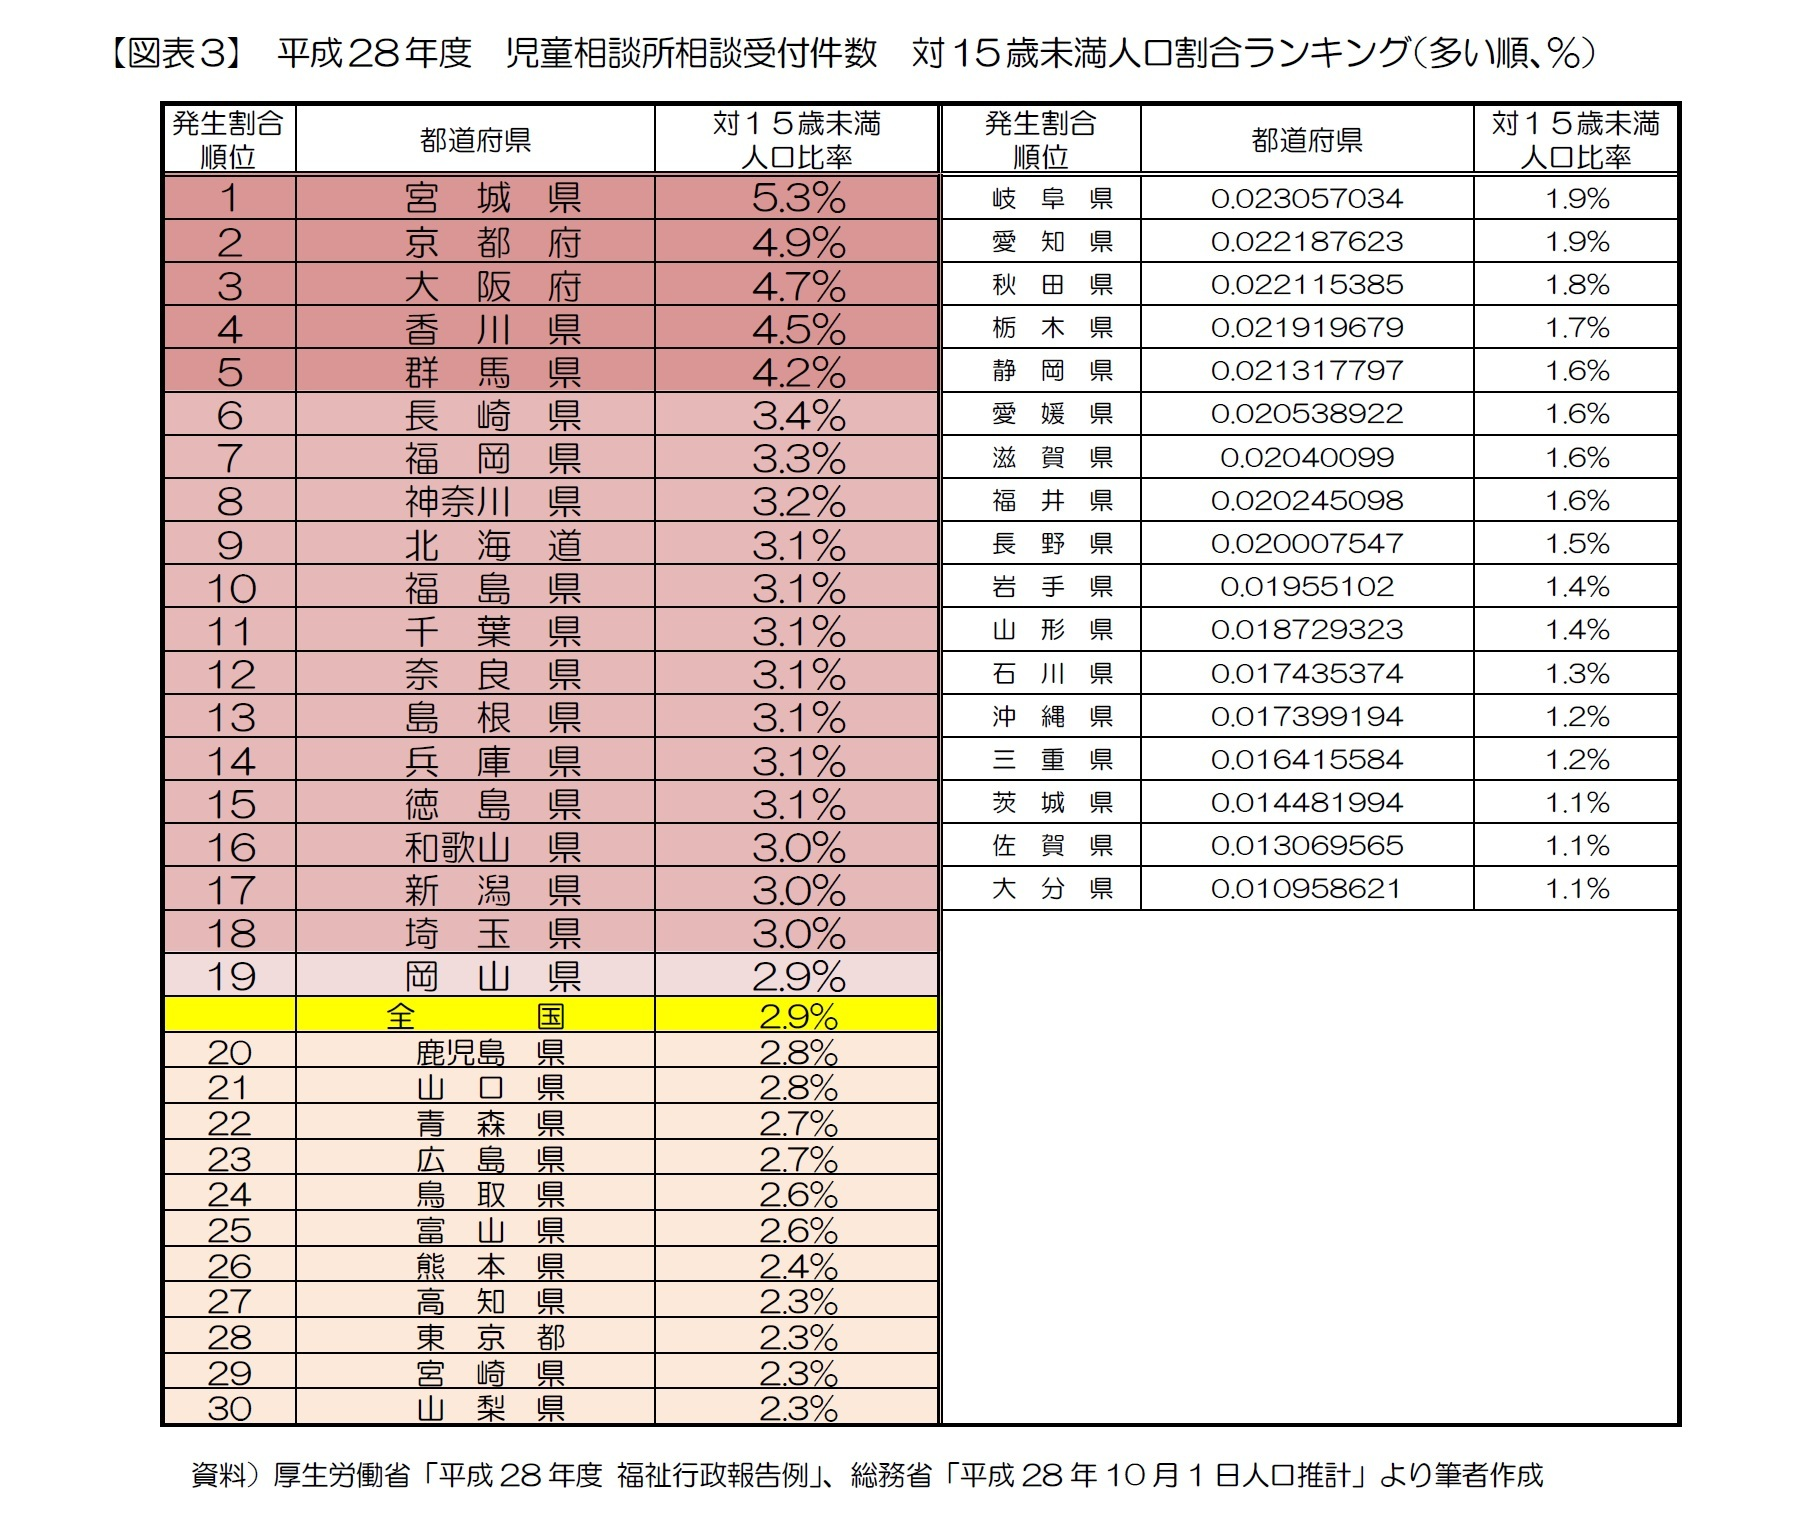 【図表3】 平成28年度 児童相談所相談受付件数 対15歳未満人口割合ランキング(多い順、%)